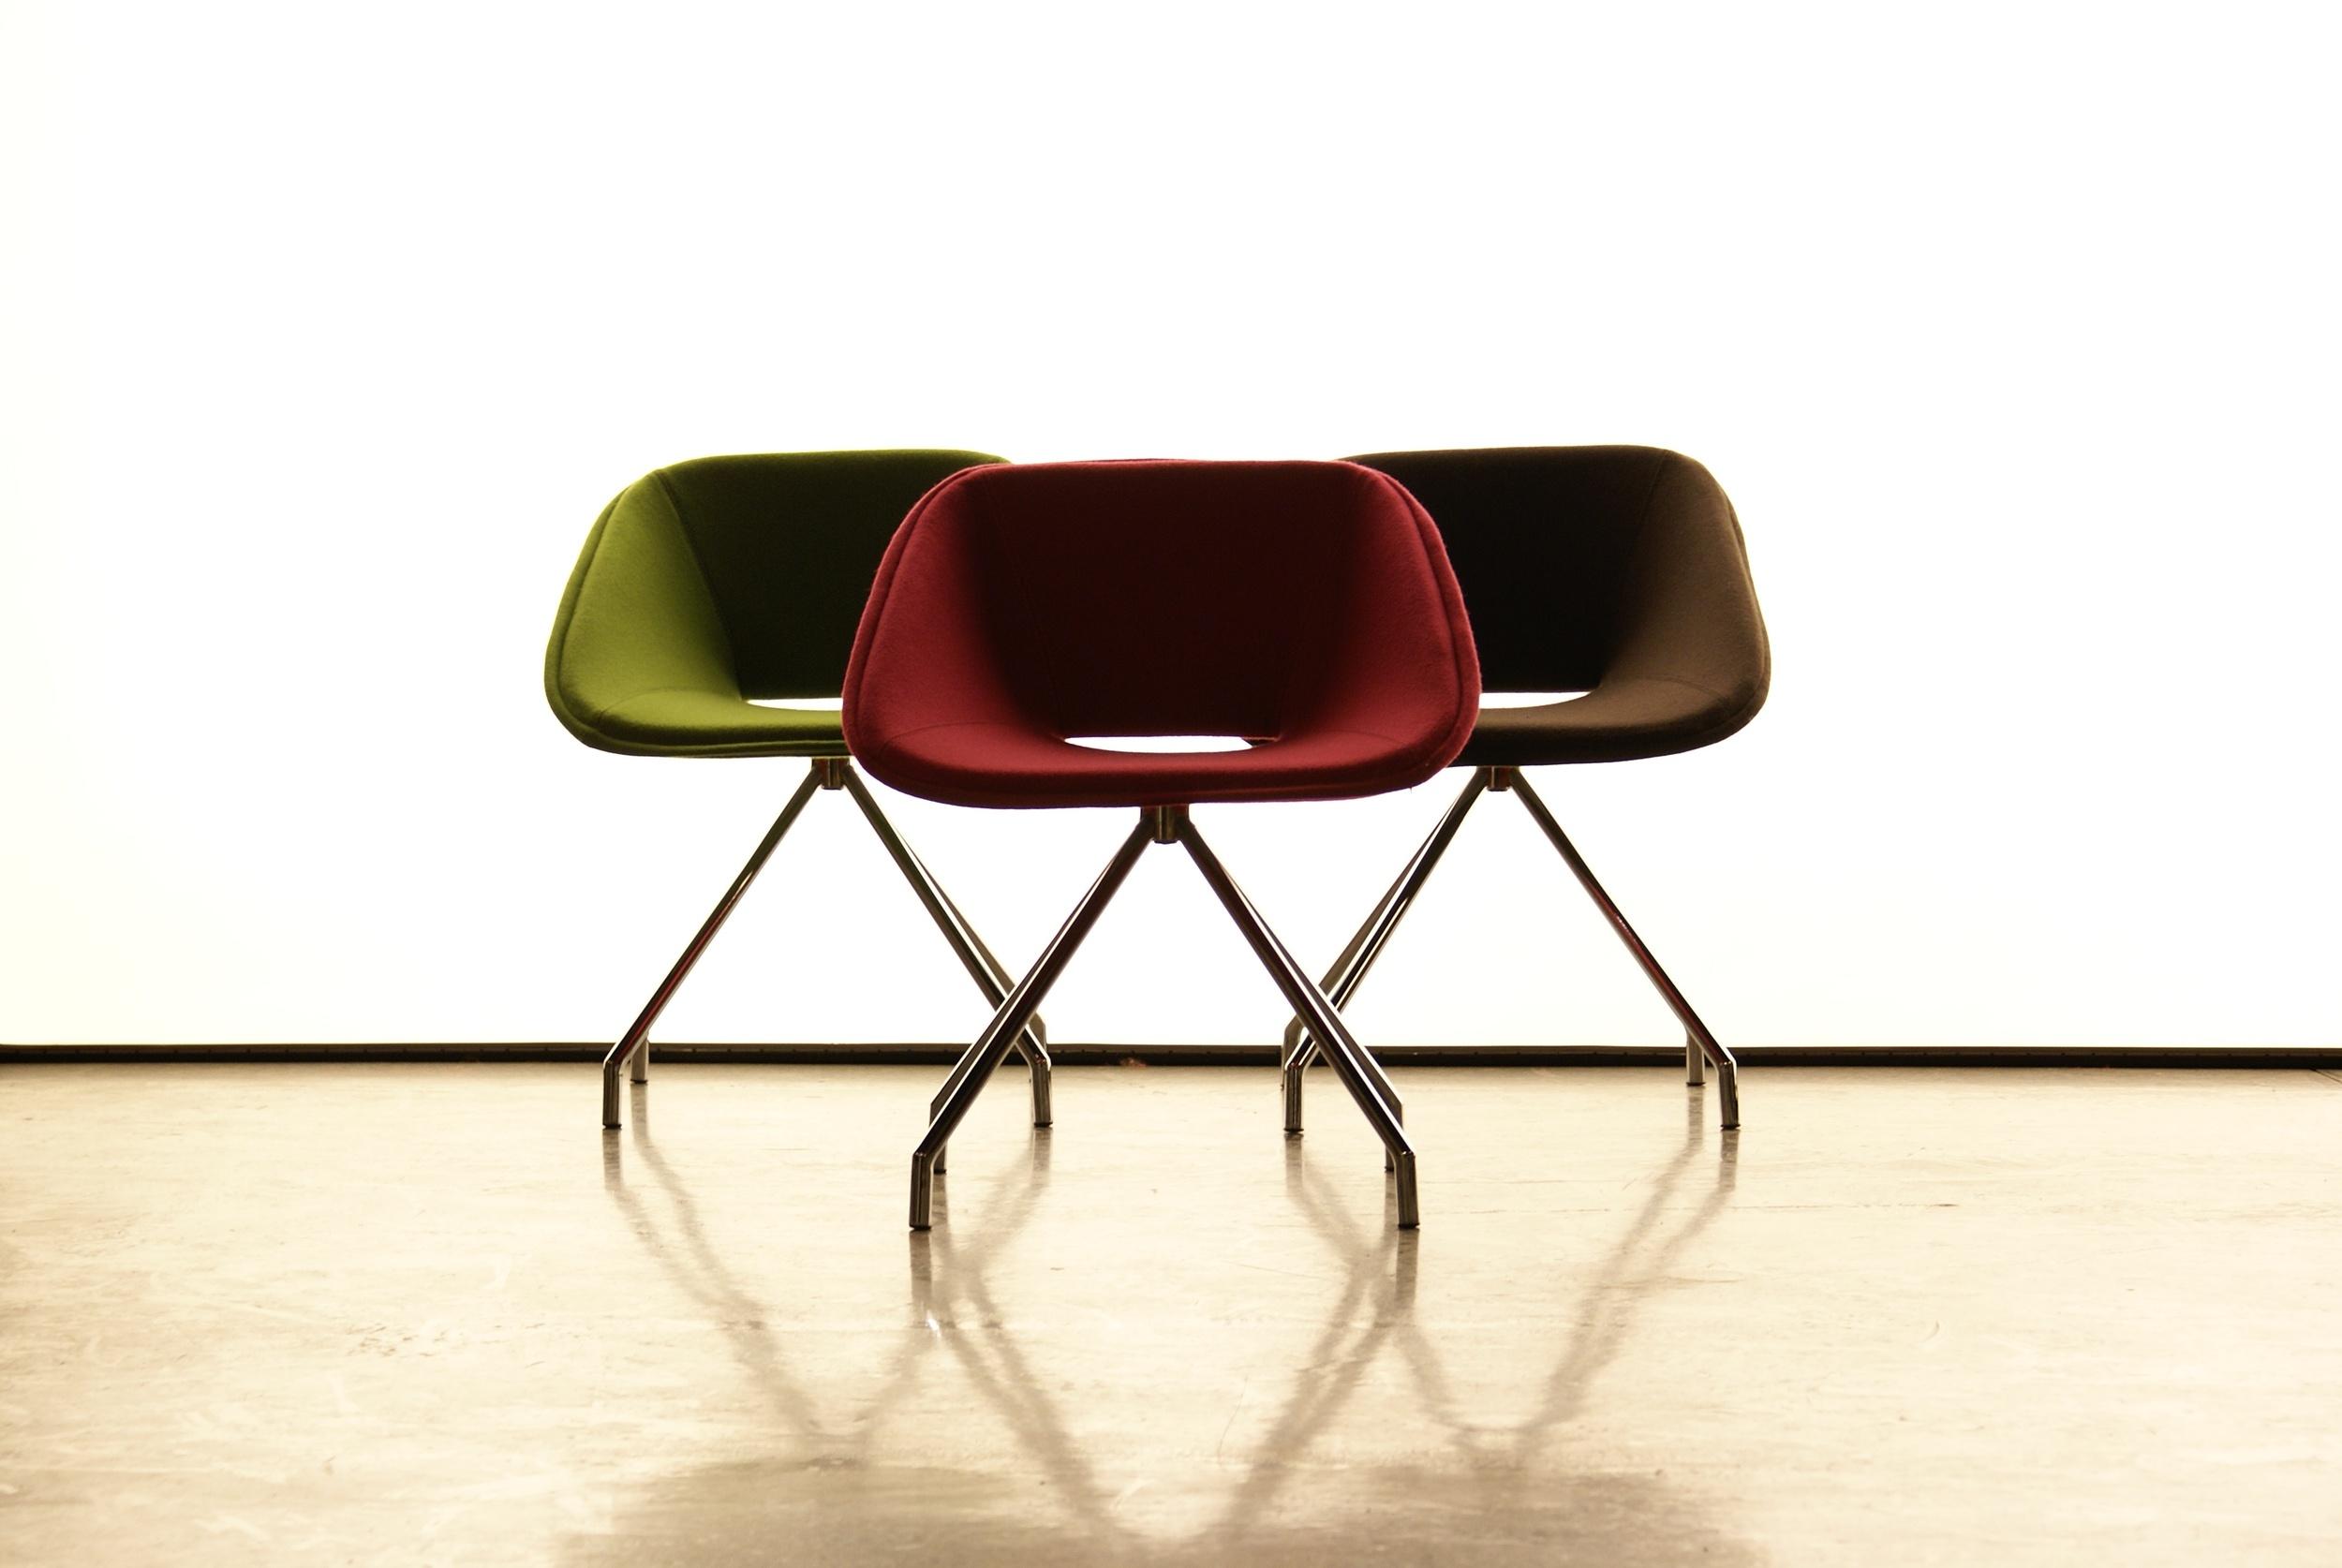 Kirmizi Chair by B&T